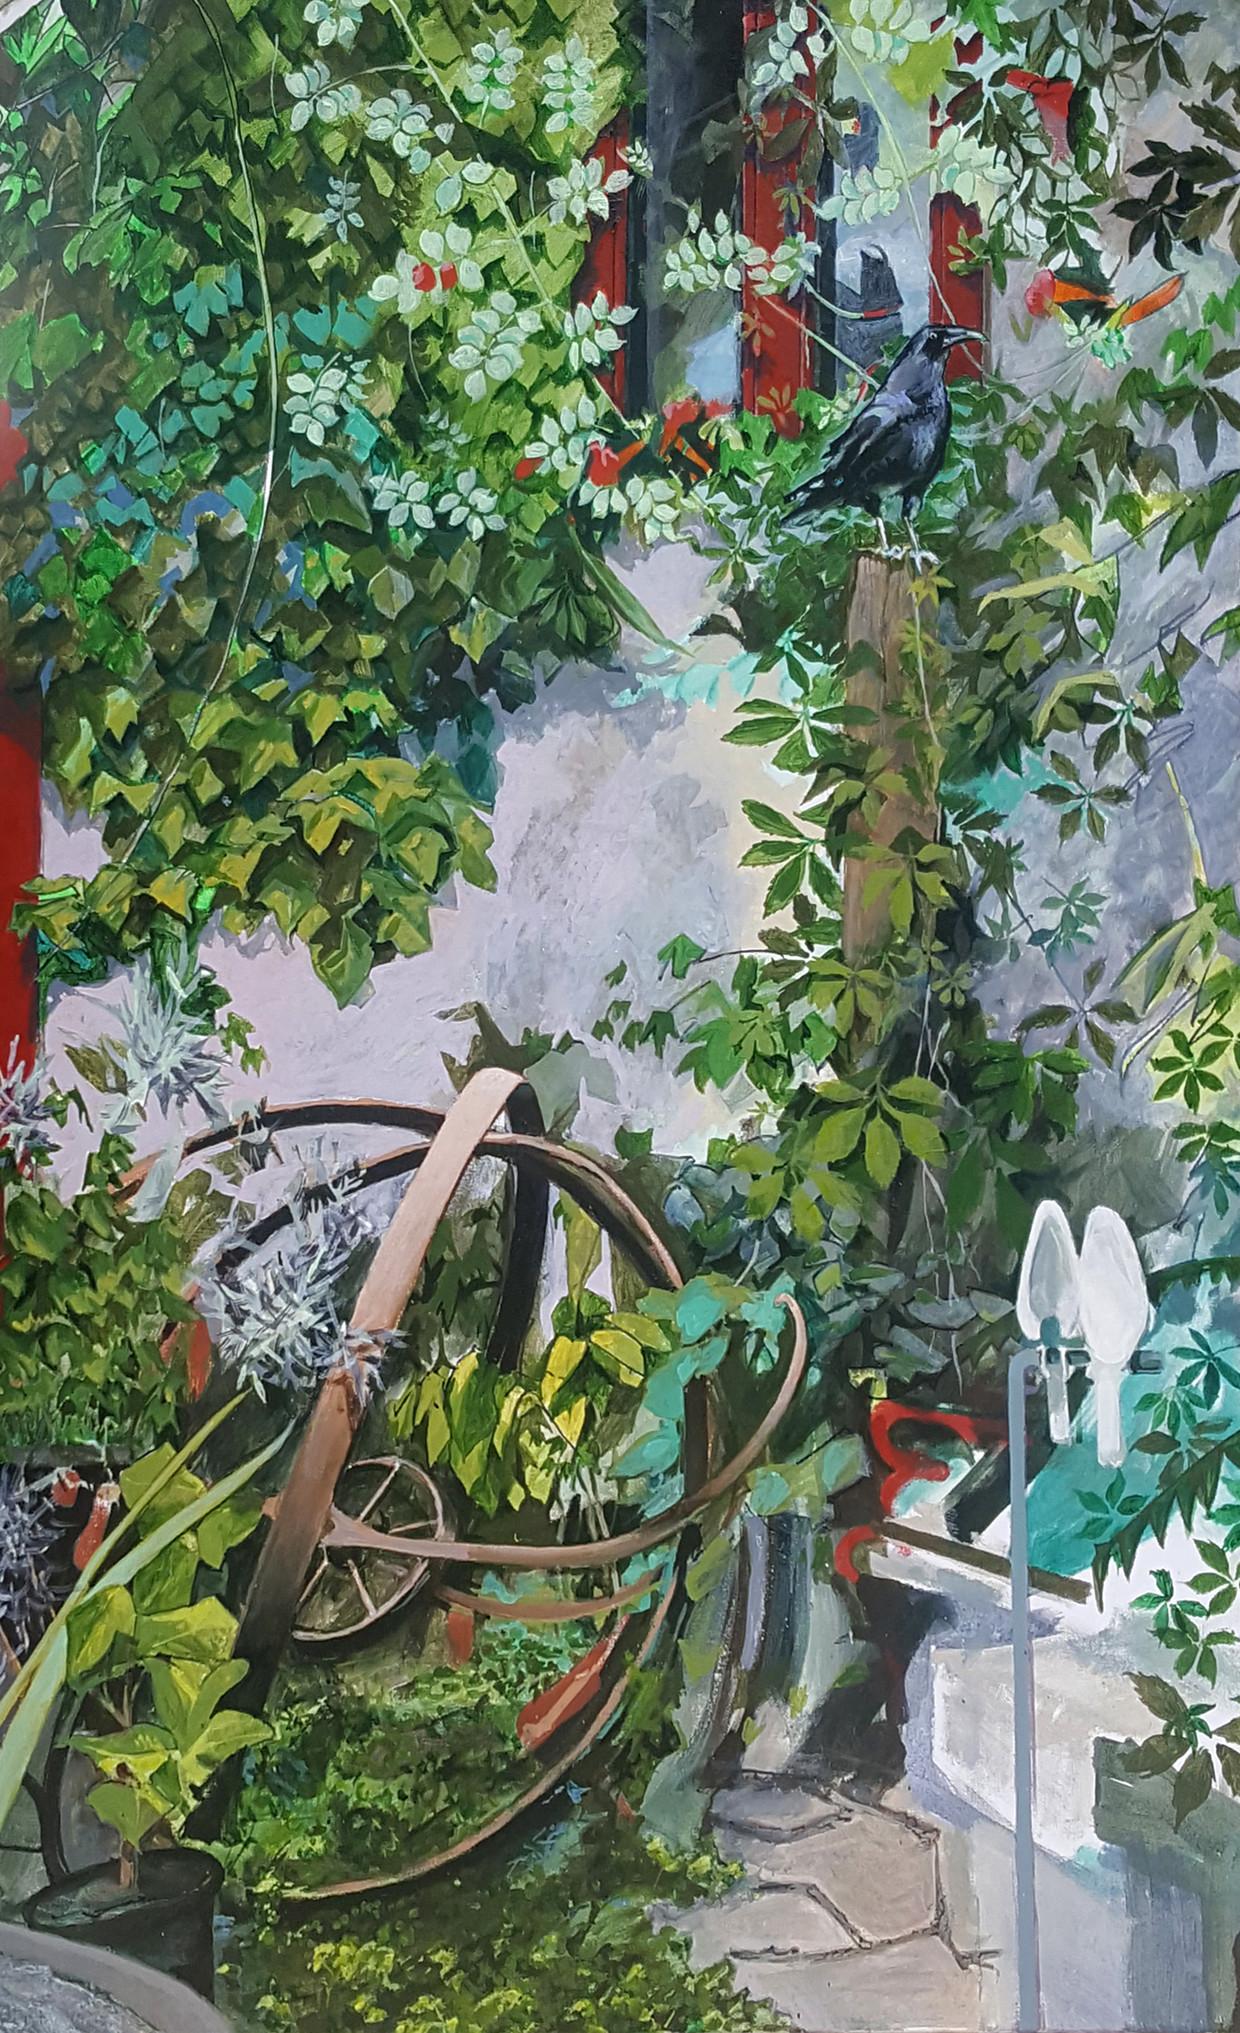 Richard Dubieniec - Magic Garden